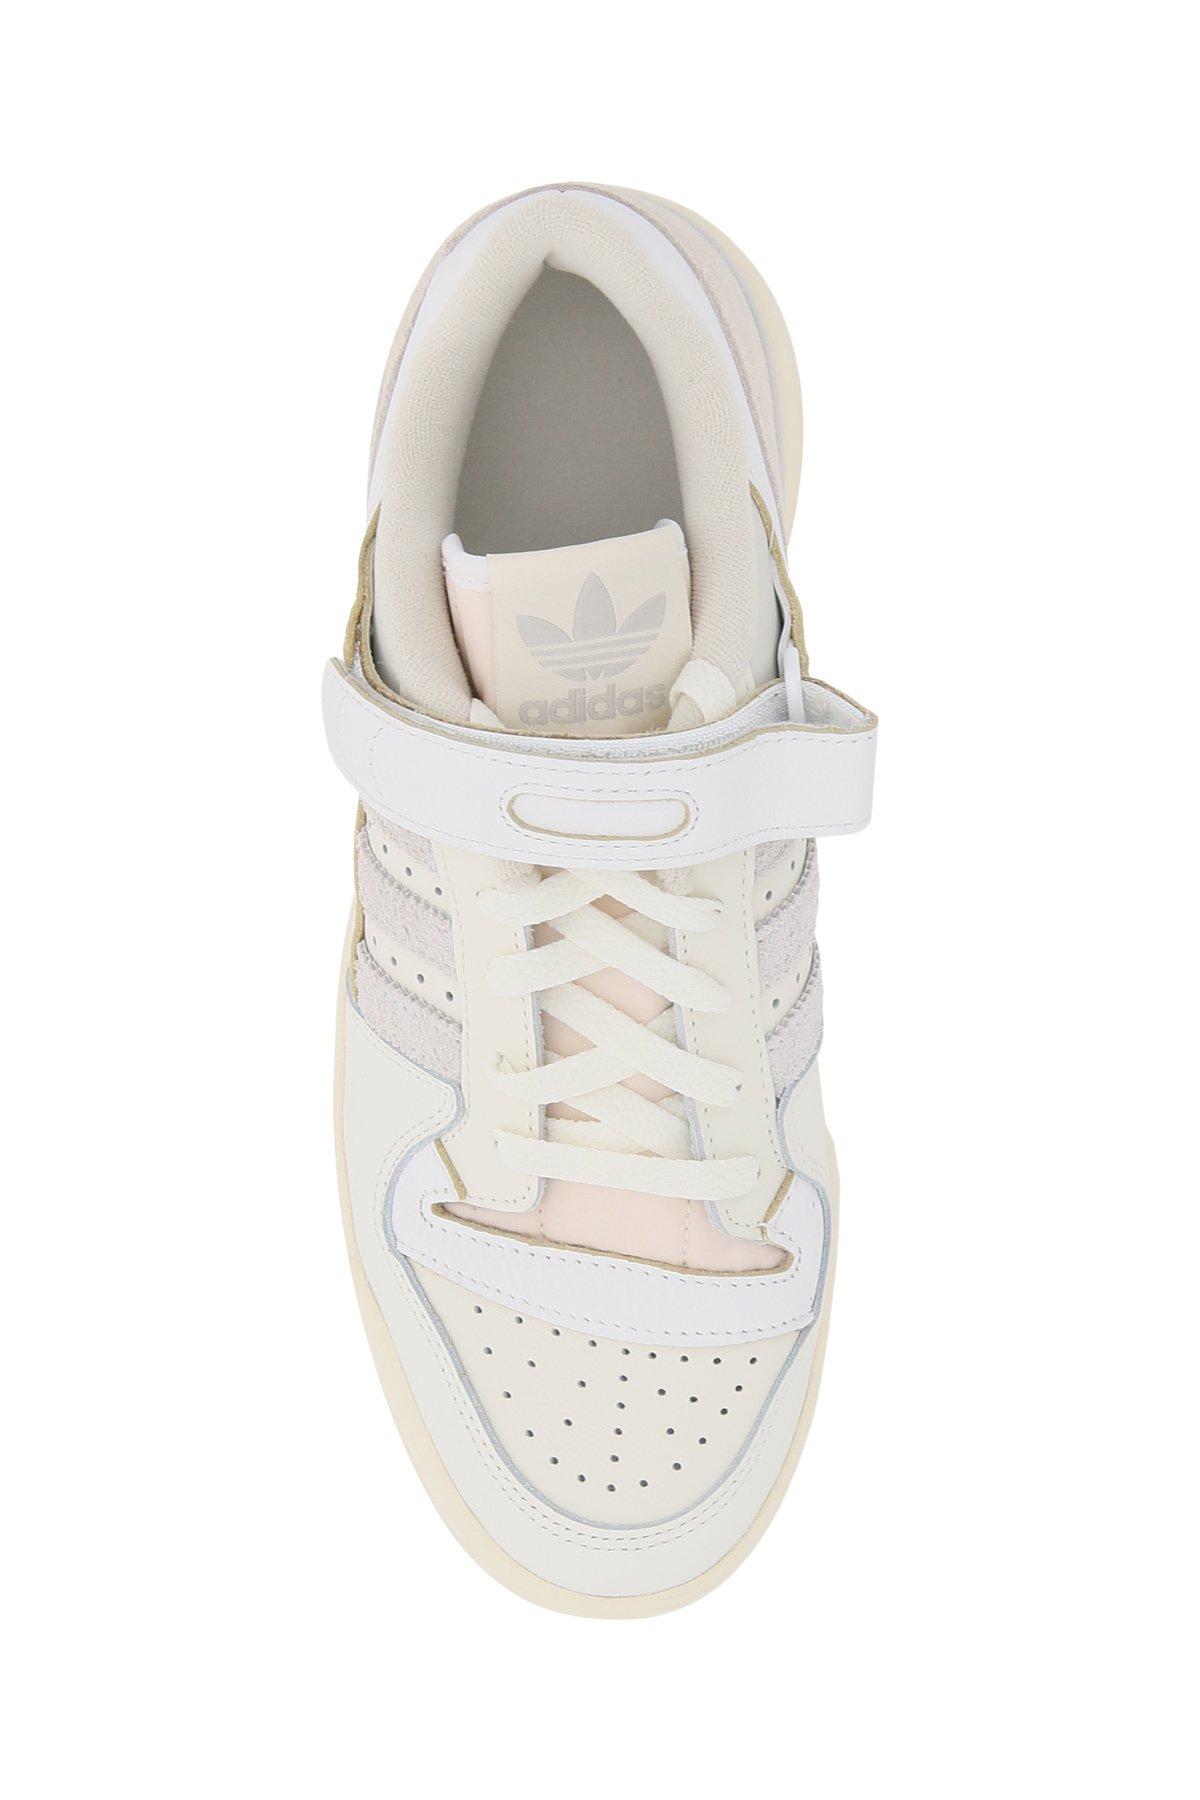 Adidas sneakers forum 84 low